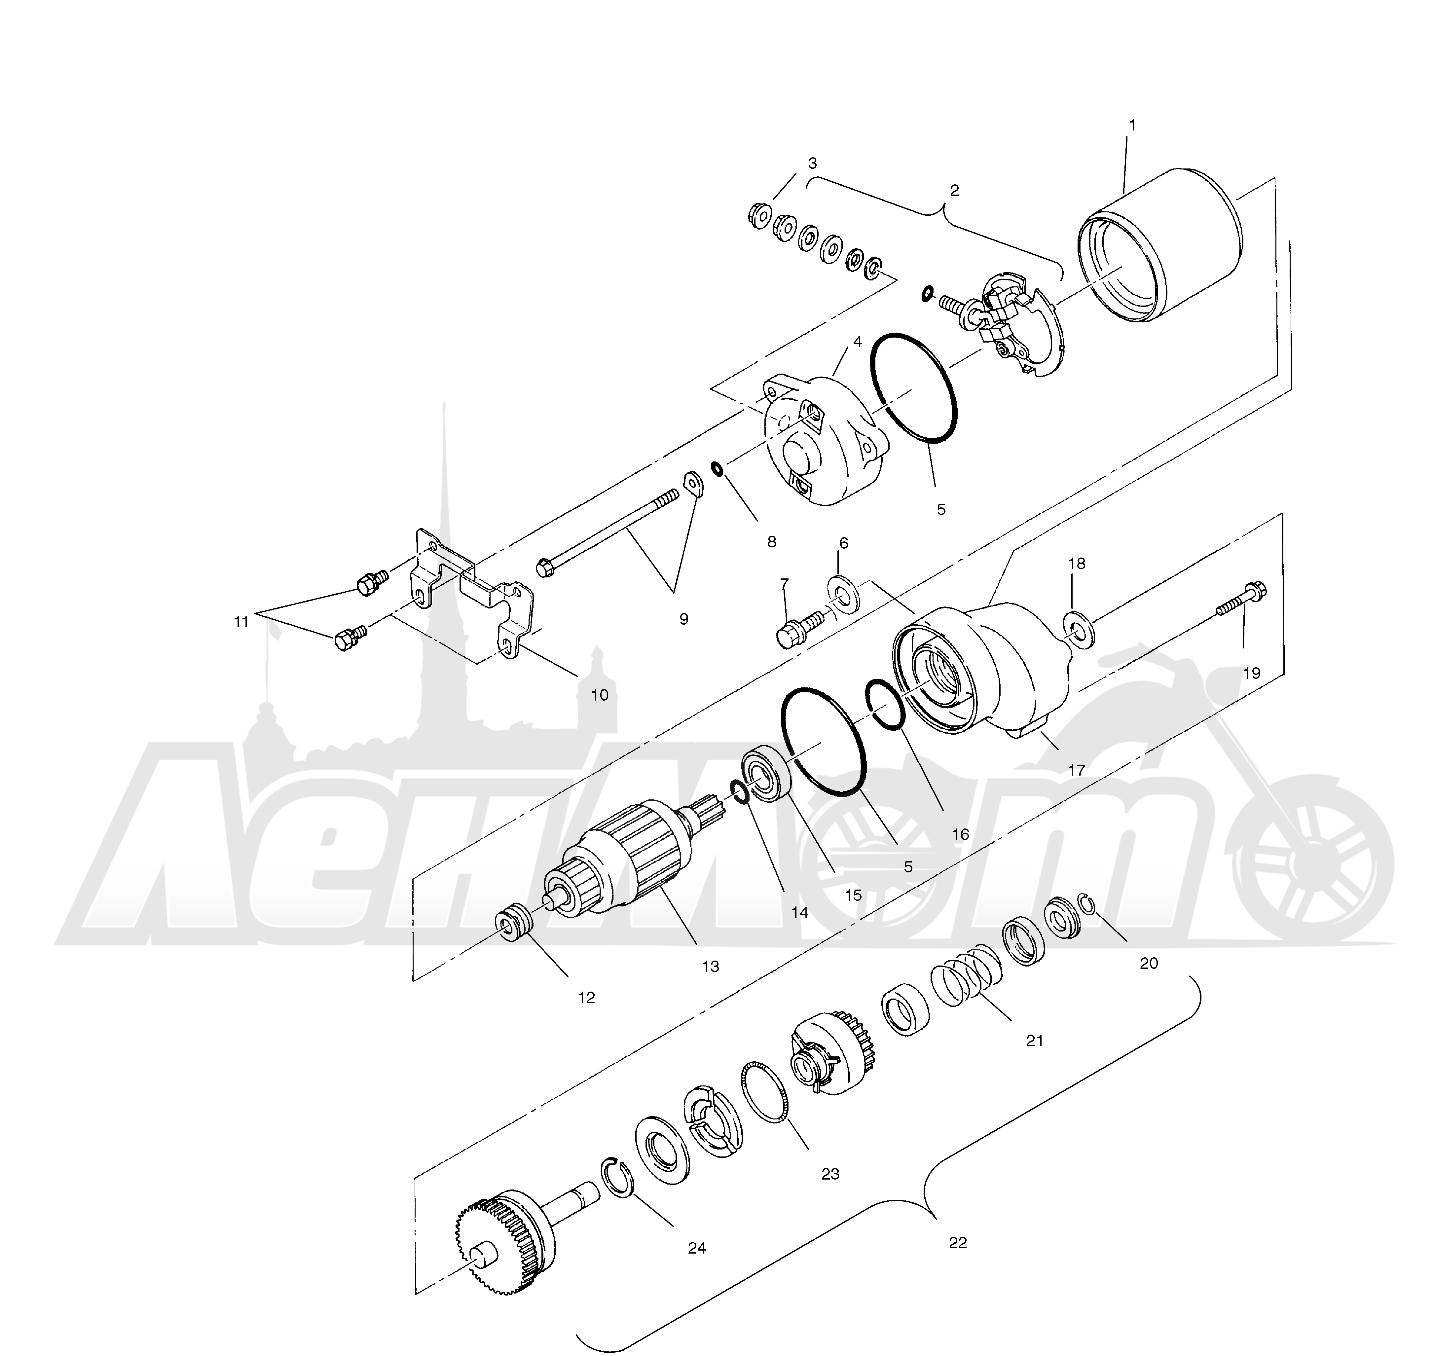 Запчасти для Квадроцикла Polaris 1996 TRAIL BLAZER ES - W967827 Раздел: STARTING MOTOR (BLAZER) - W967827 | электростартер (BLAZER) W967827